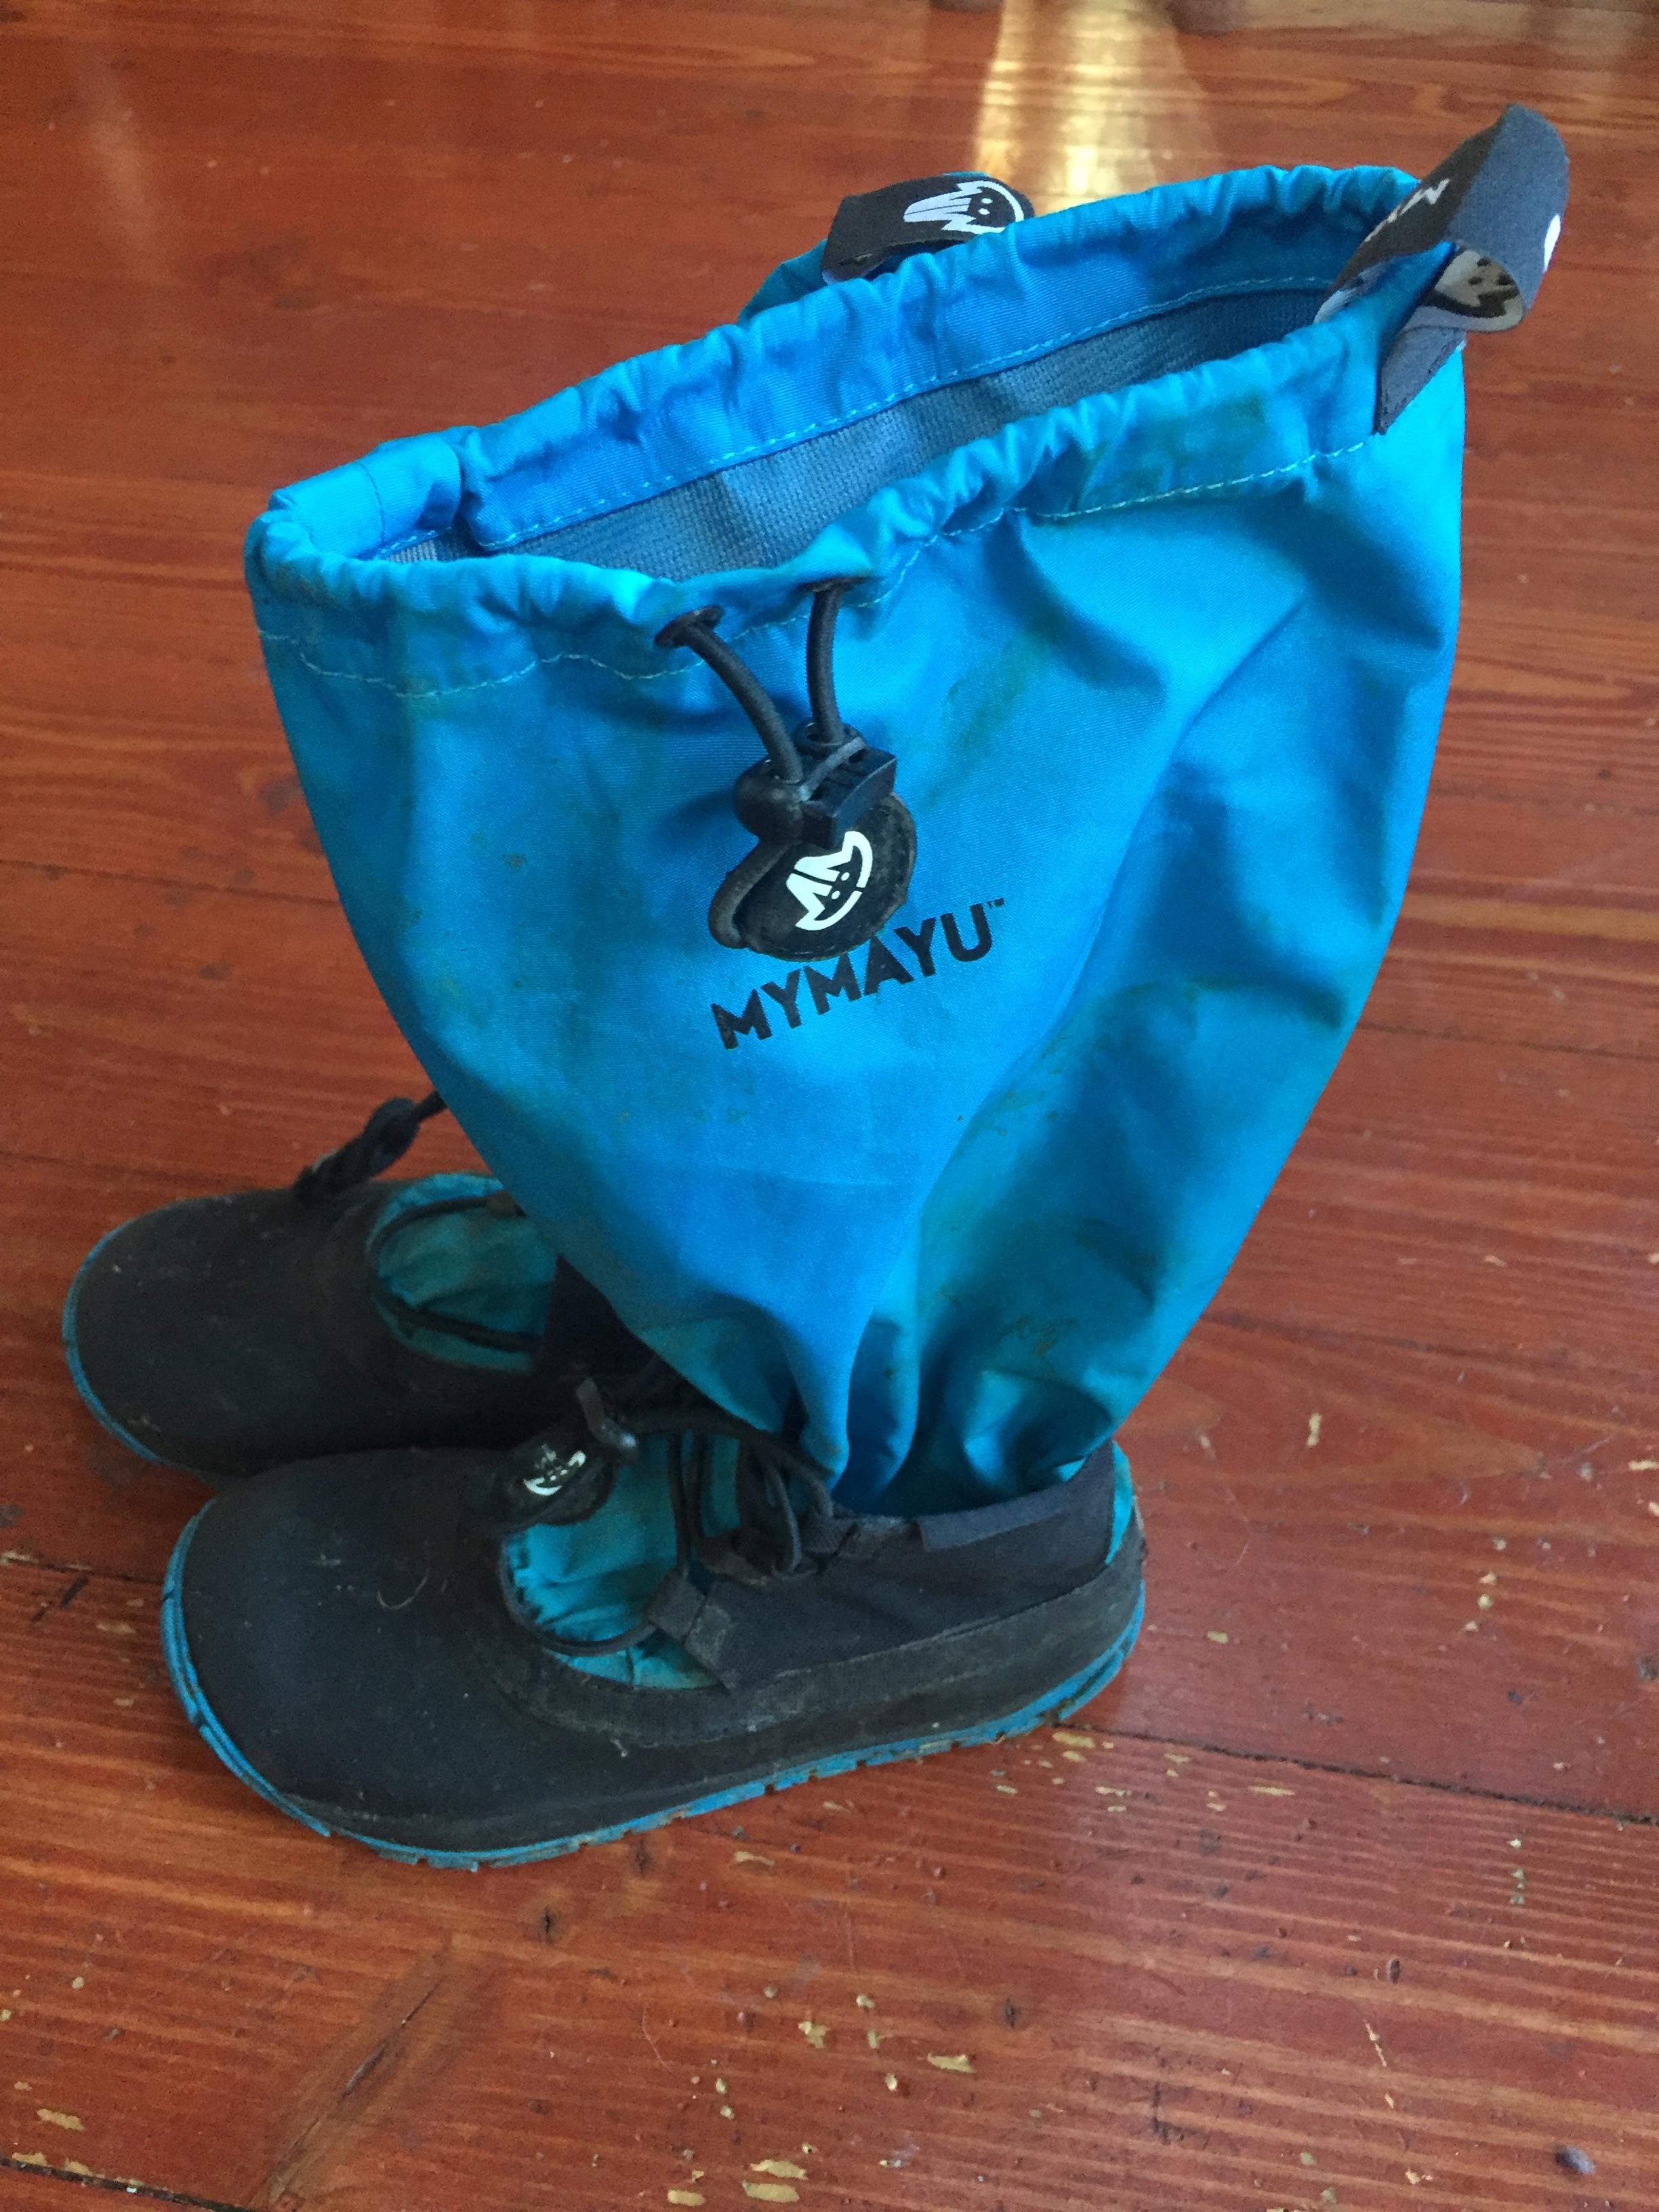 Mymayu rain boots blue Traveler style